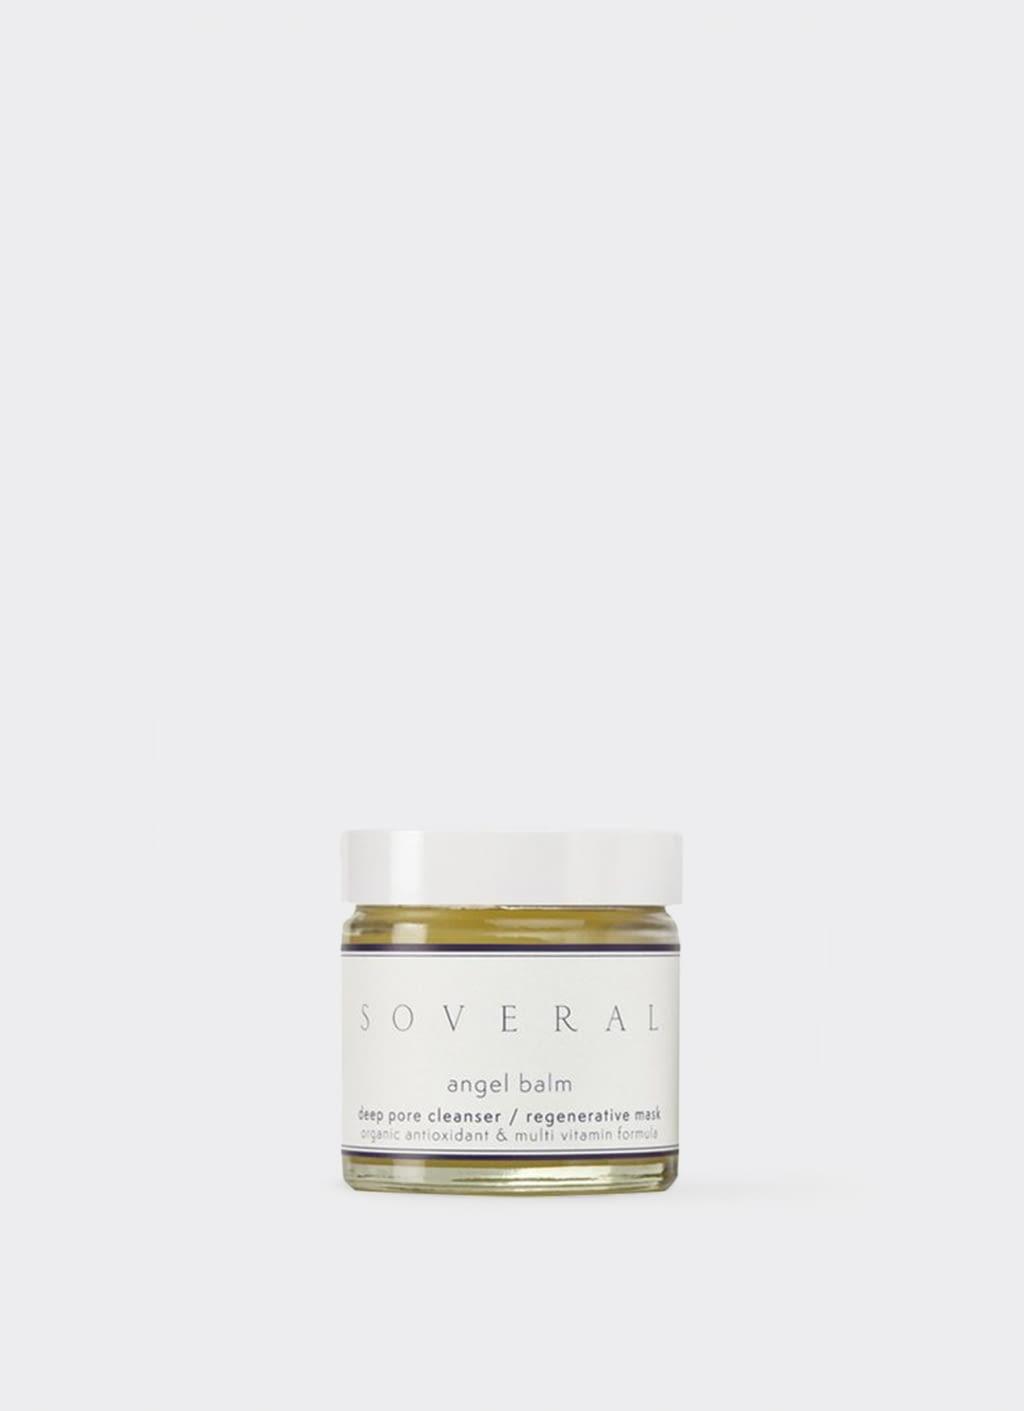 Buy Original Soveral Angel Balm Deep Pore Cleanser And Regenerative Mask